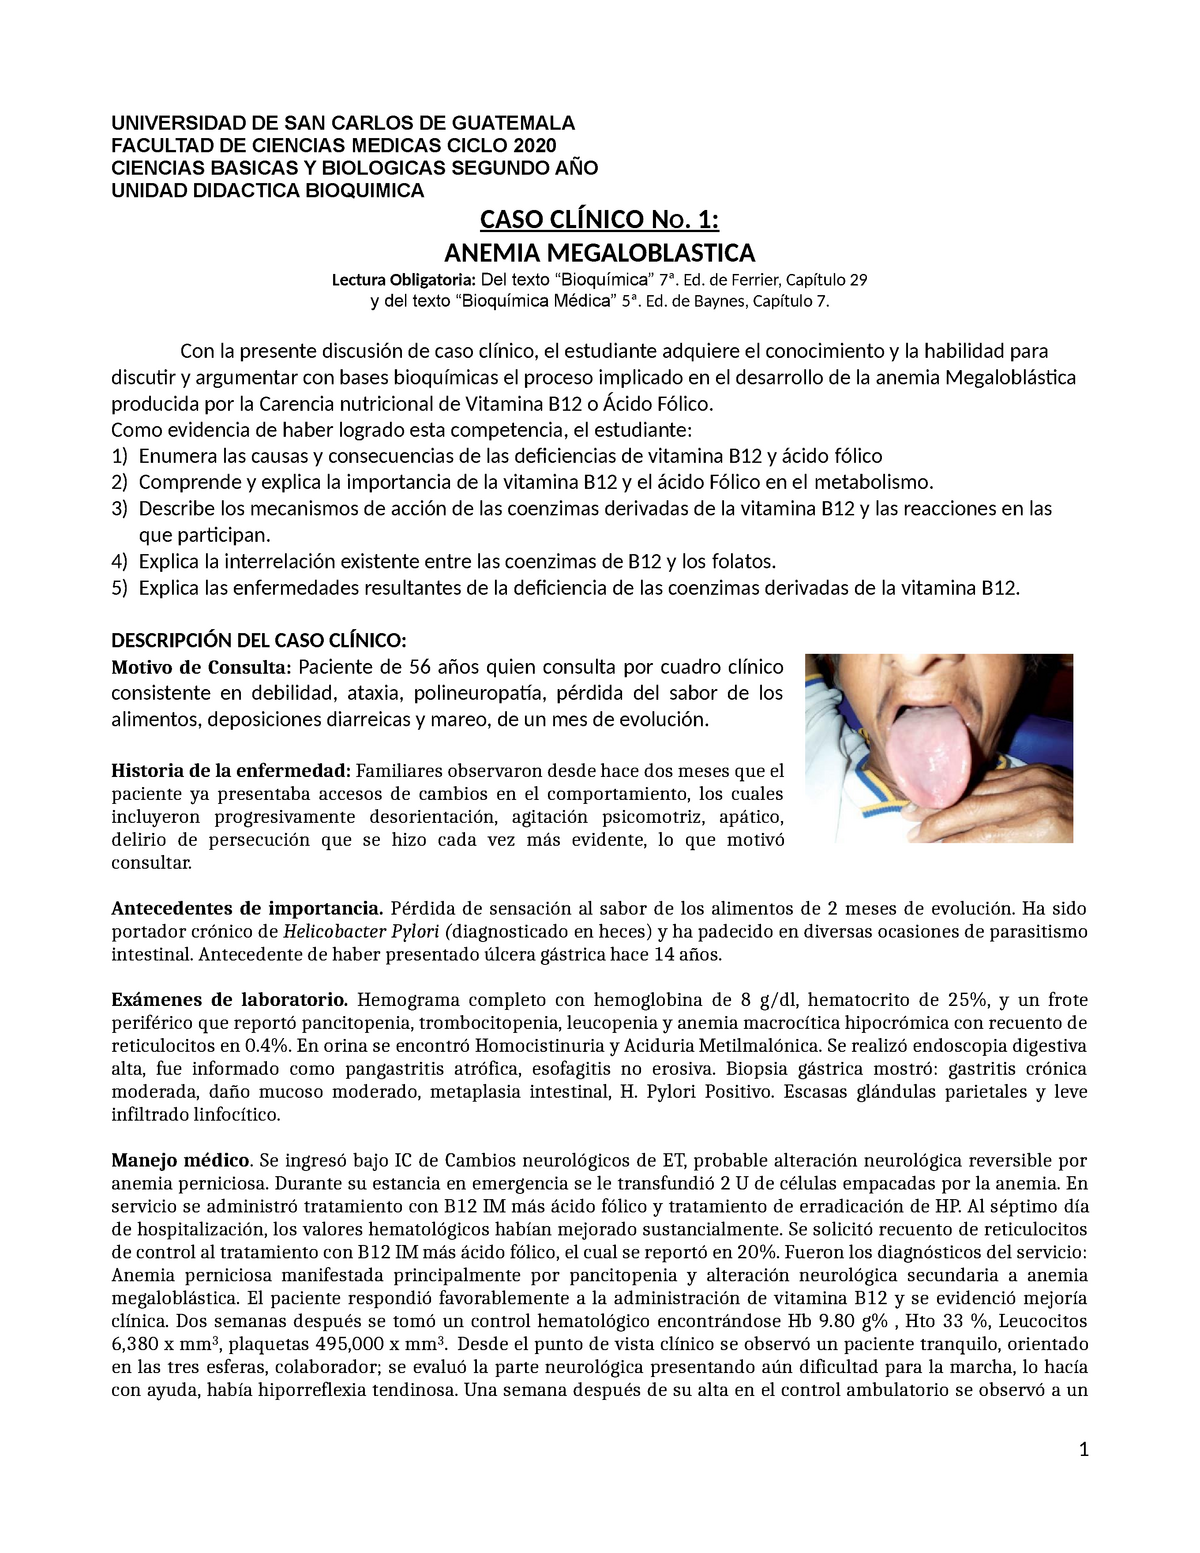 cuadro clinico de anemia megaloblastica pdf